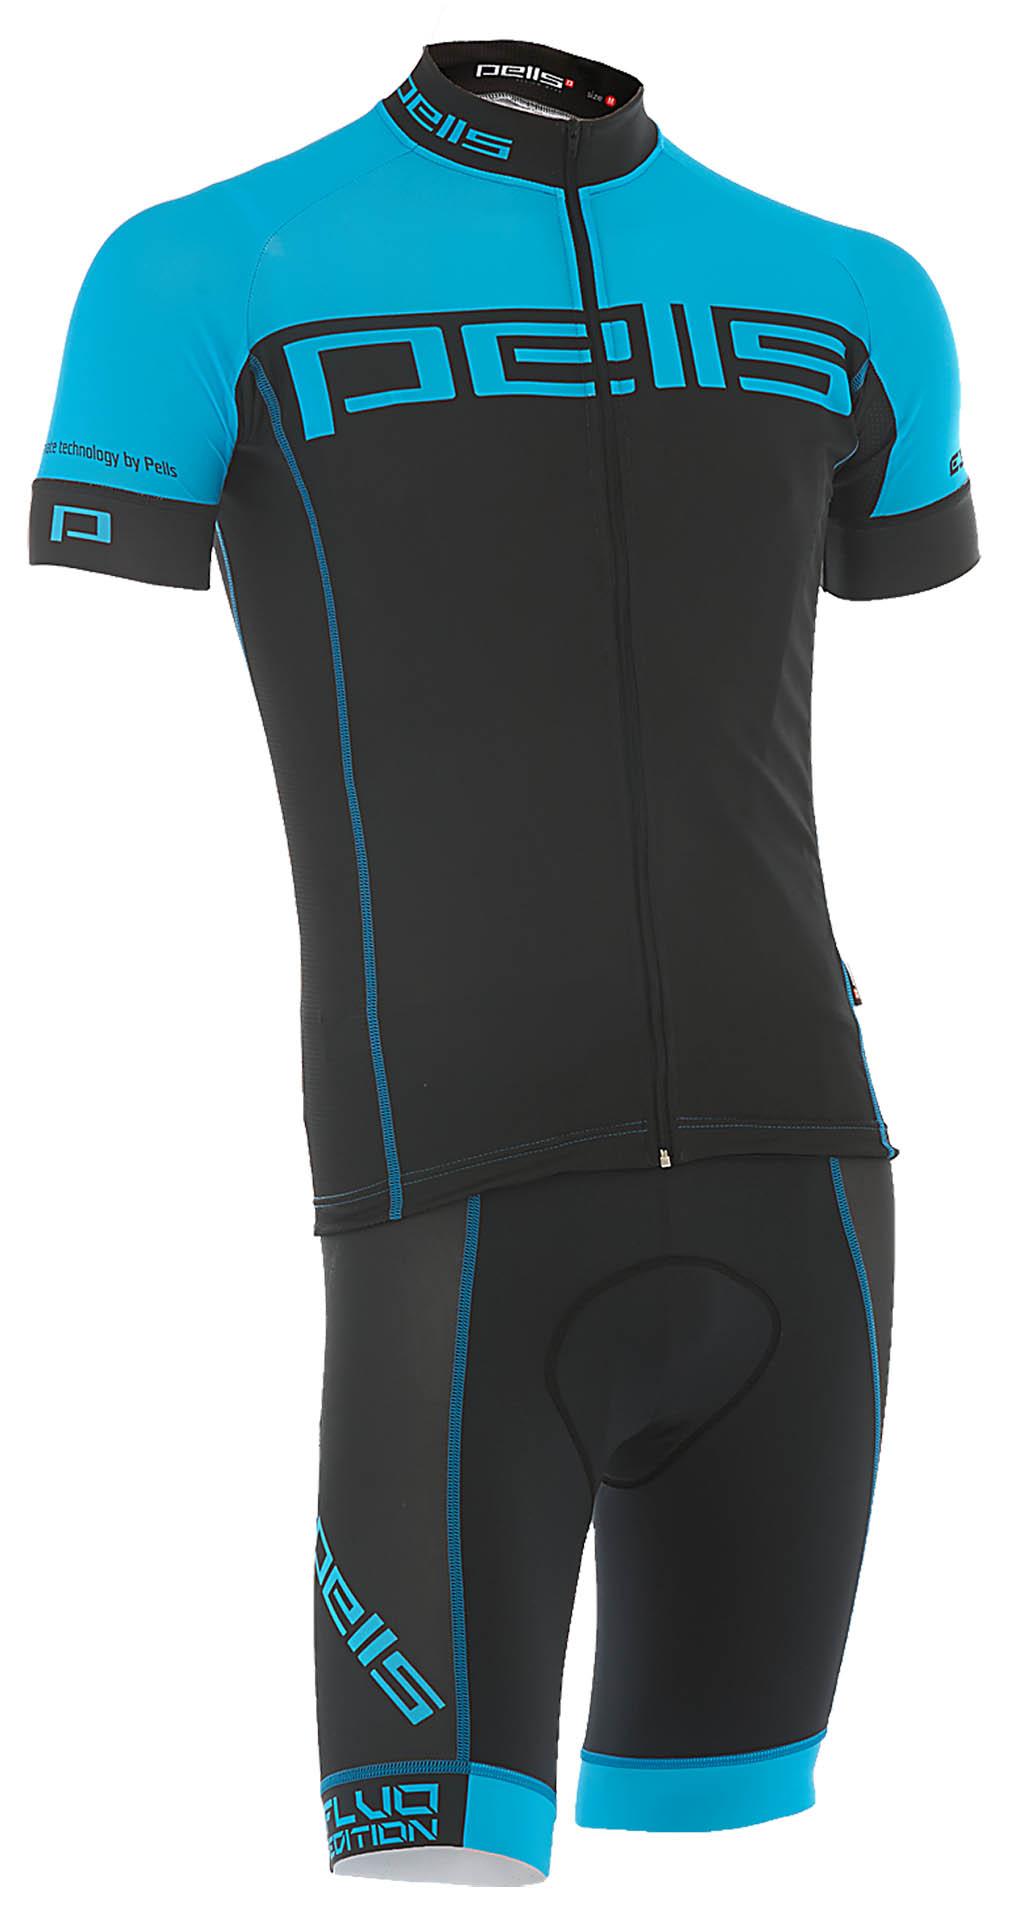 Pánský dres PELL'S FLUO, vel. L, modrá, krátký rukáv - ZDARMA DOPRAVNÉ! (Pánský cyklistický dres PELL'S, vel. L, krátký rukáv, barva modrá dle vyobrazení!)